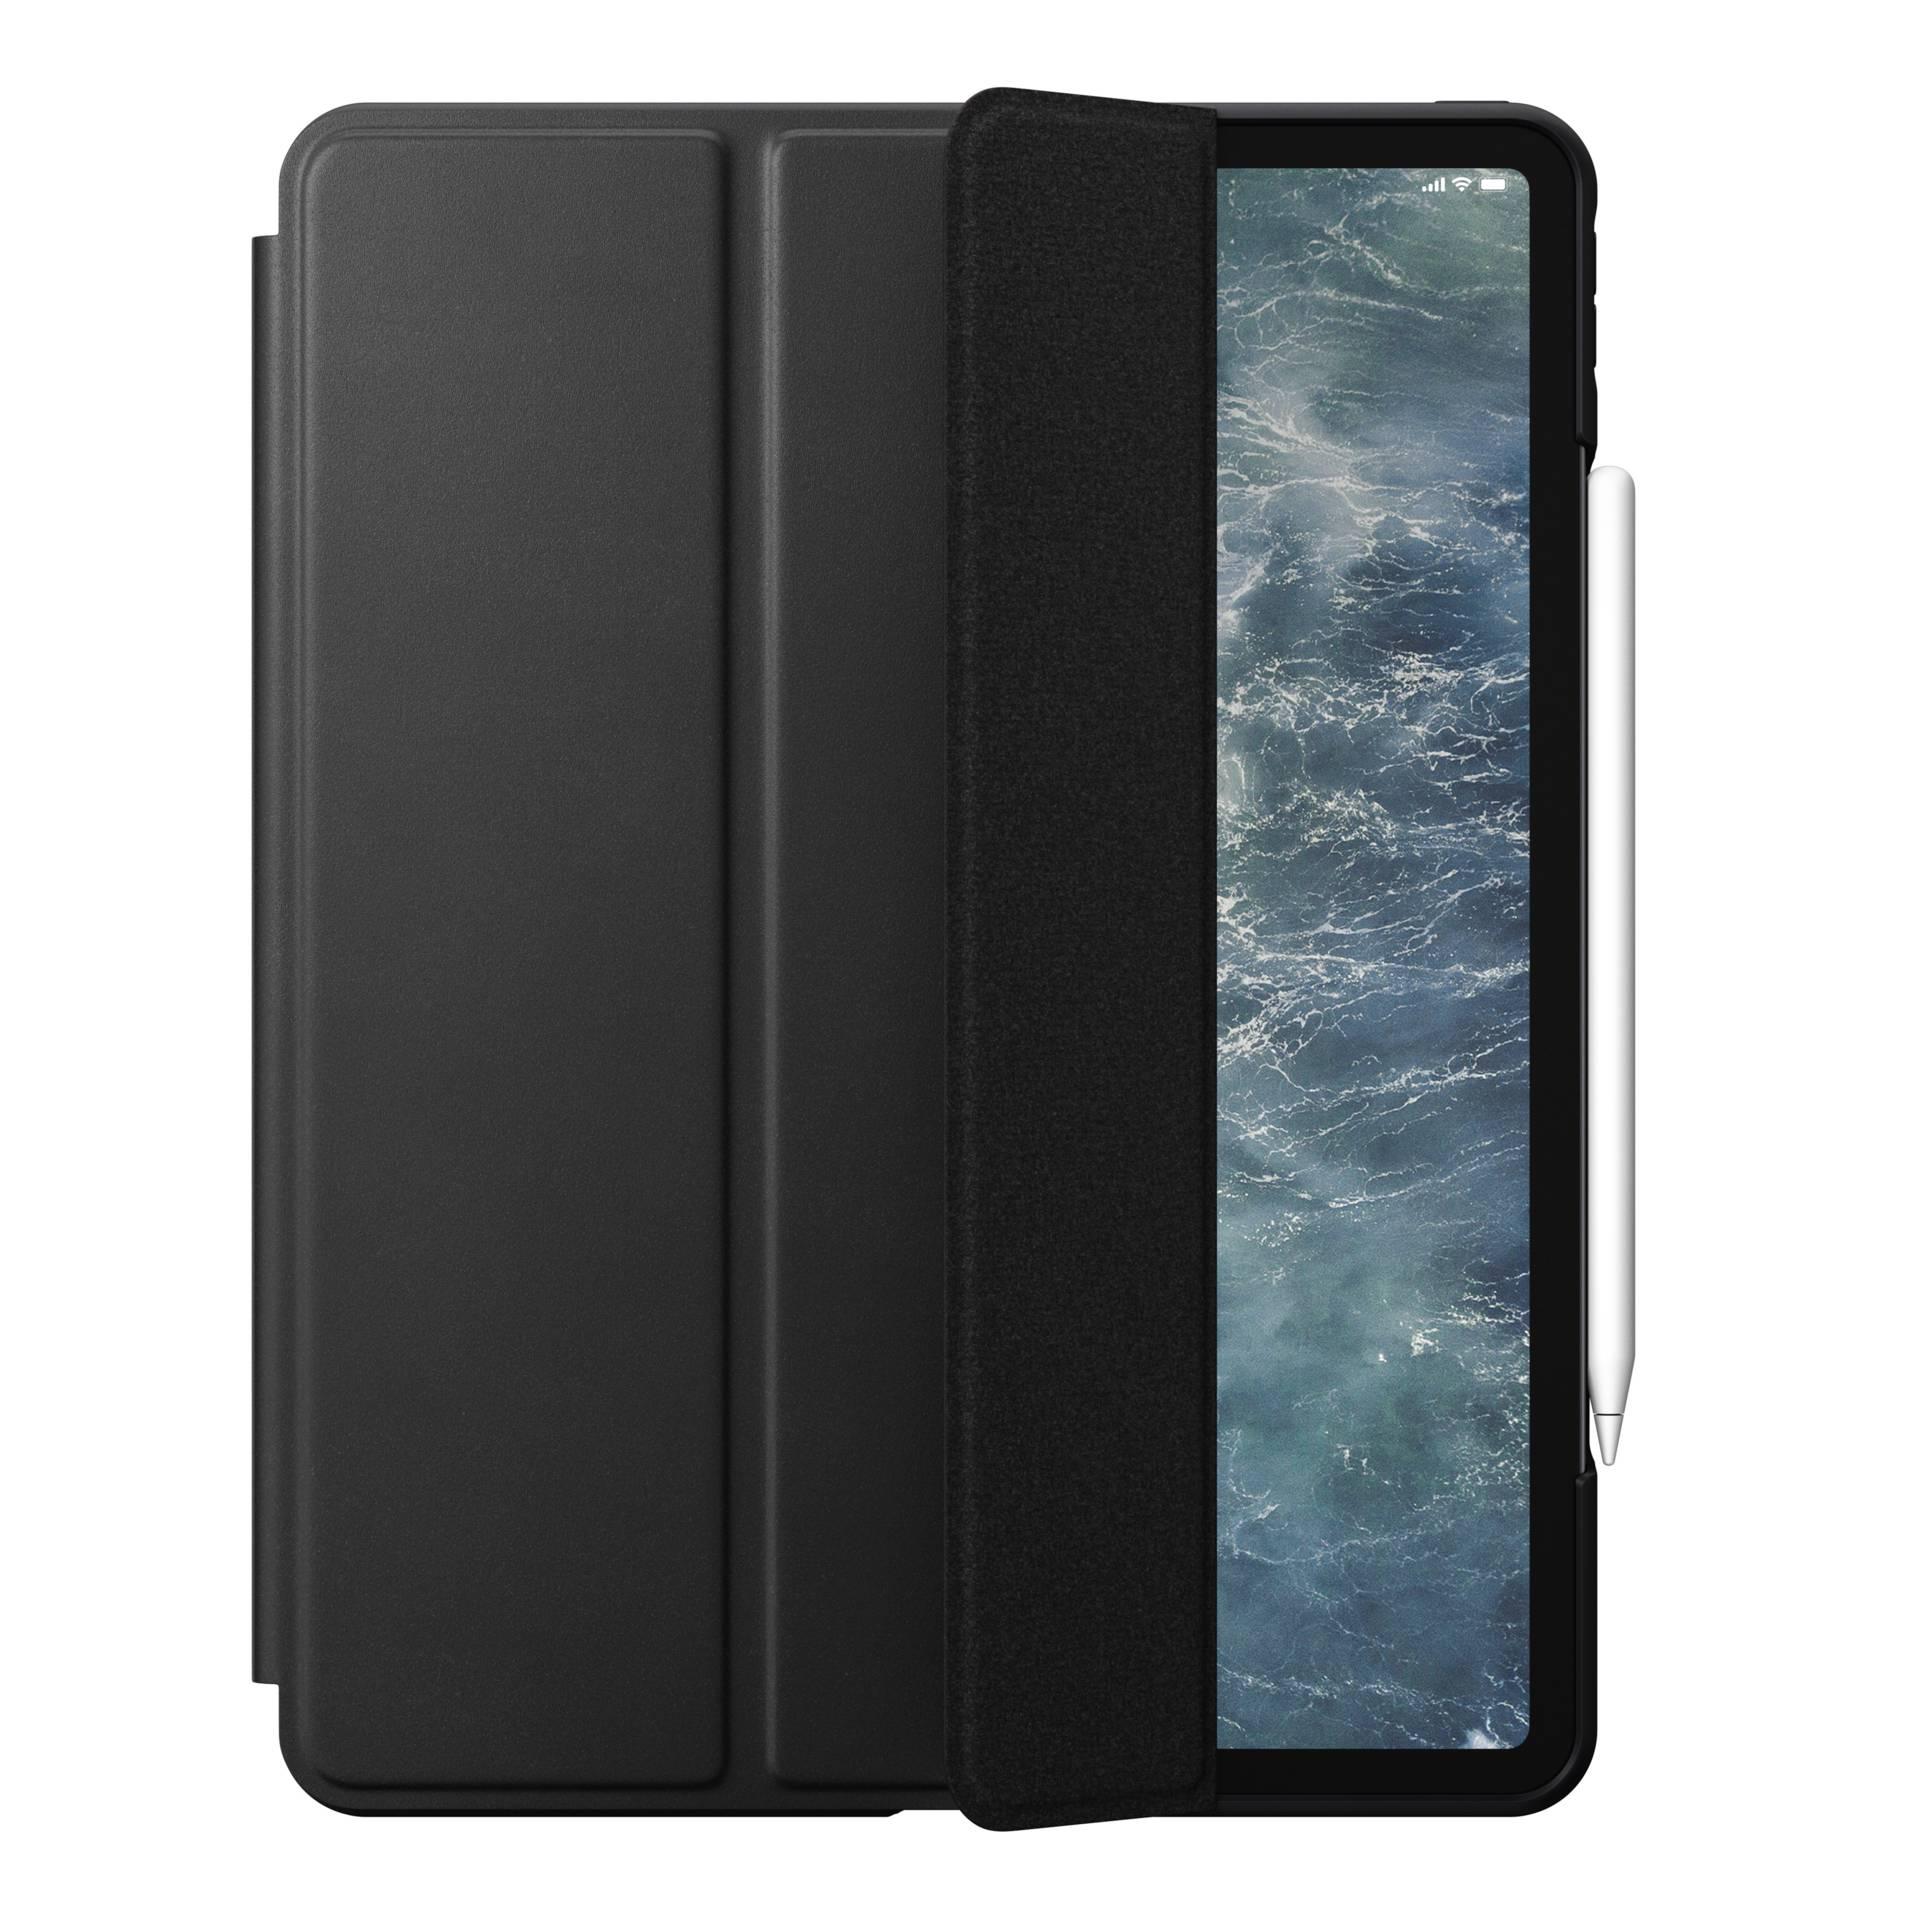 "Nomad Rugged Leather Folio Case für iPad Pro 12,9"" Black"